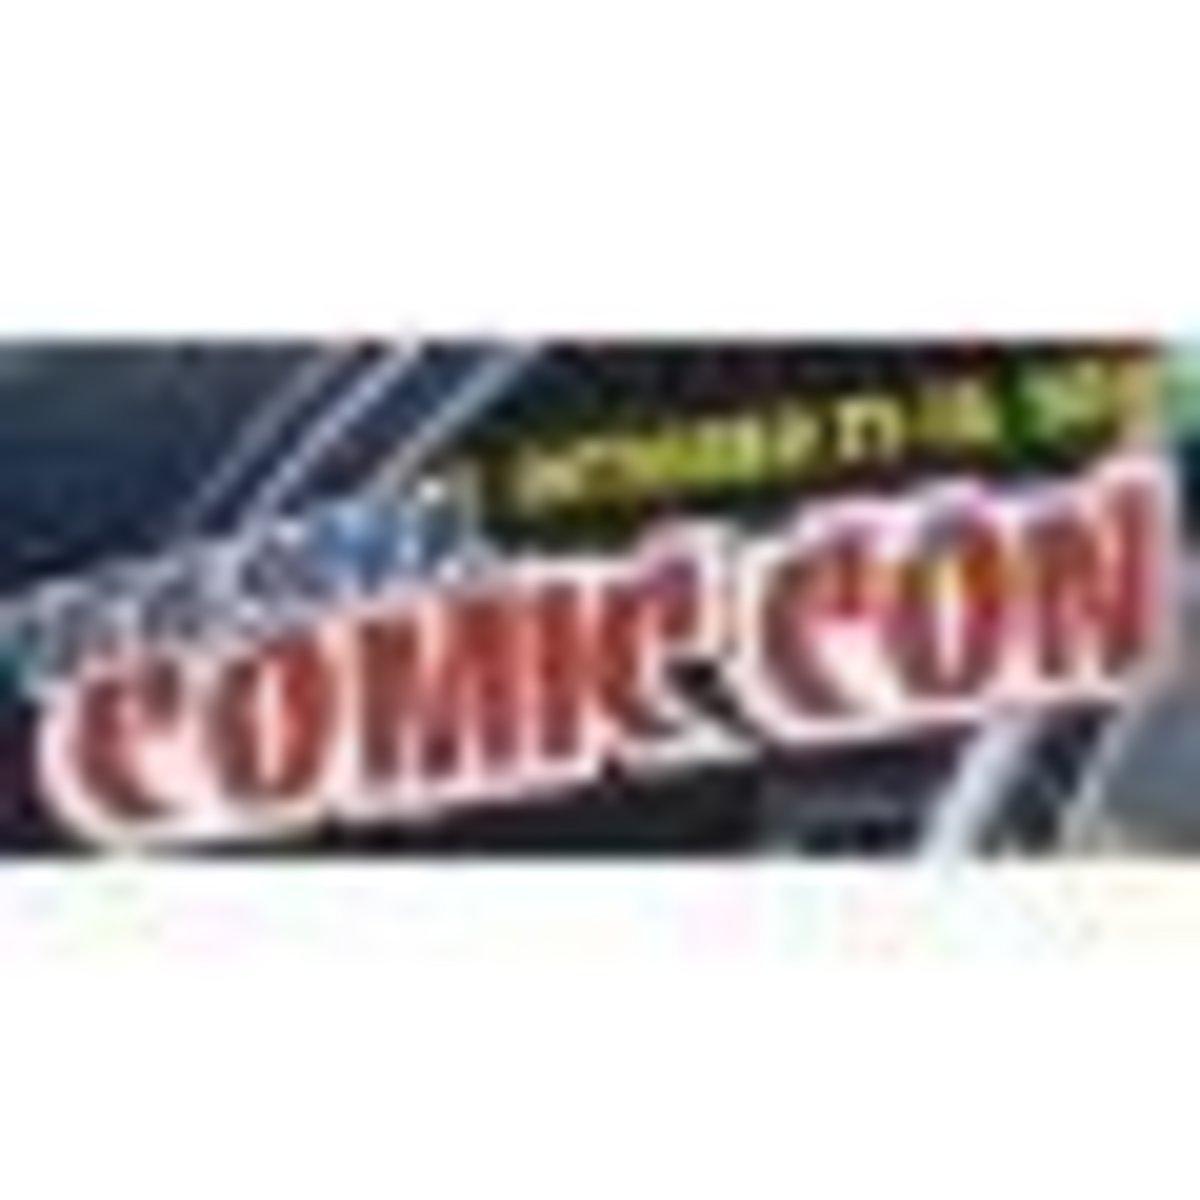 the-rampaging-hulk-marvel-comic-book-review